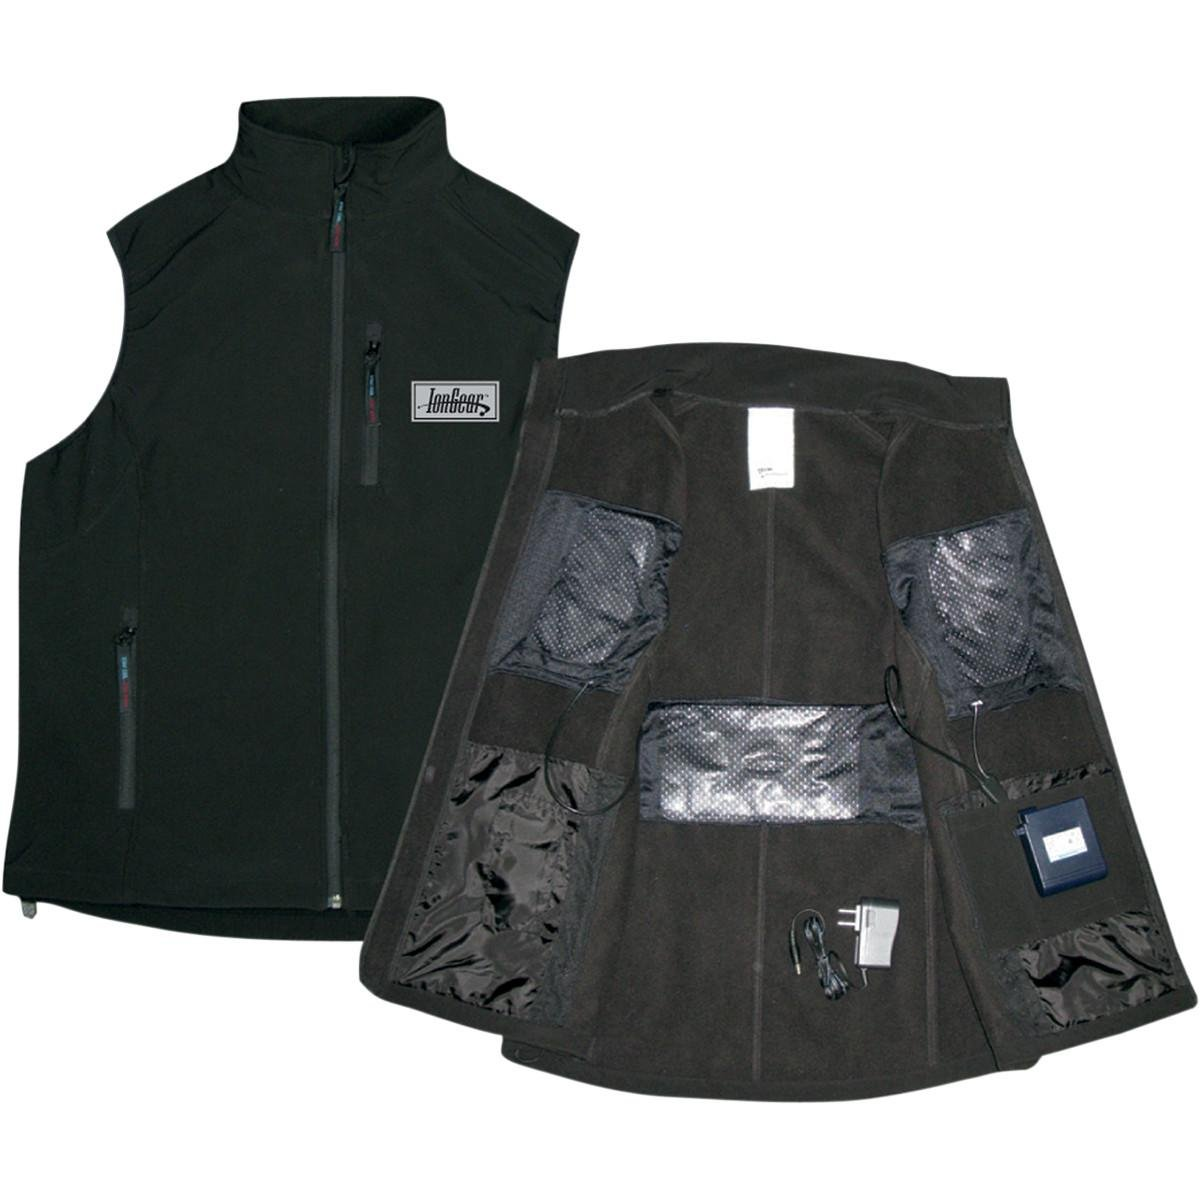 IonGear 5627 Battery Powered Heated Vest, Medium